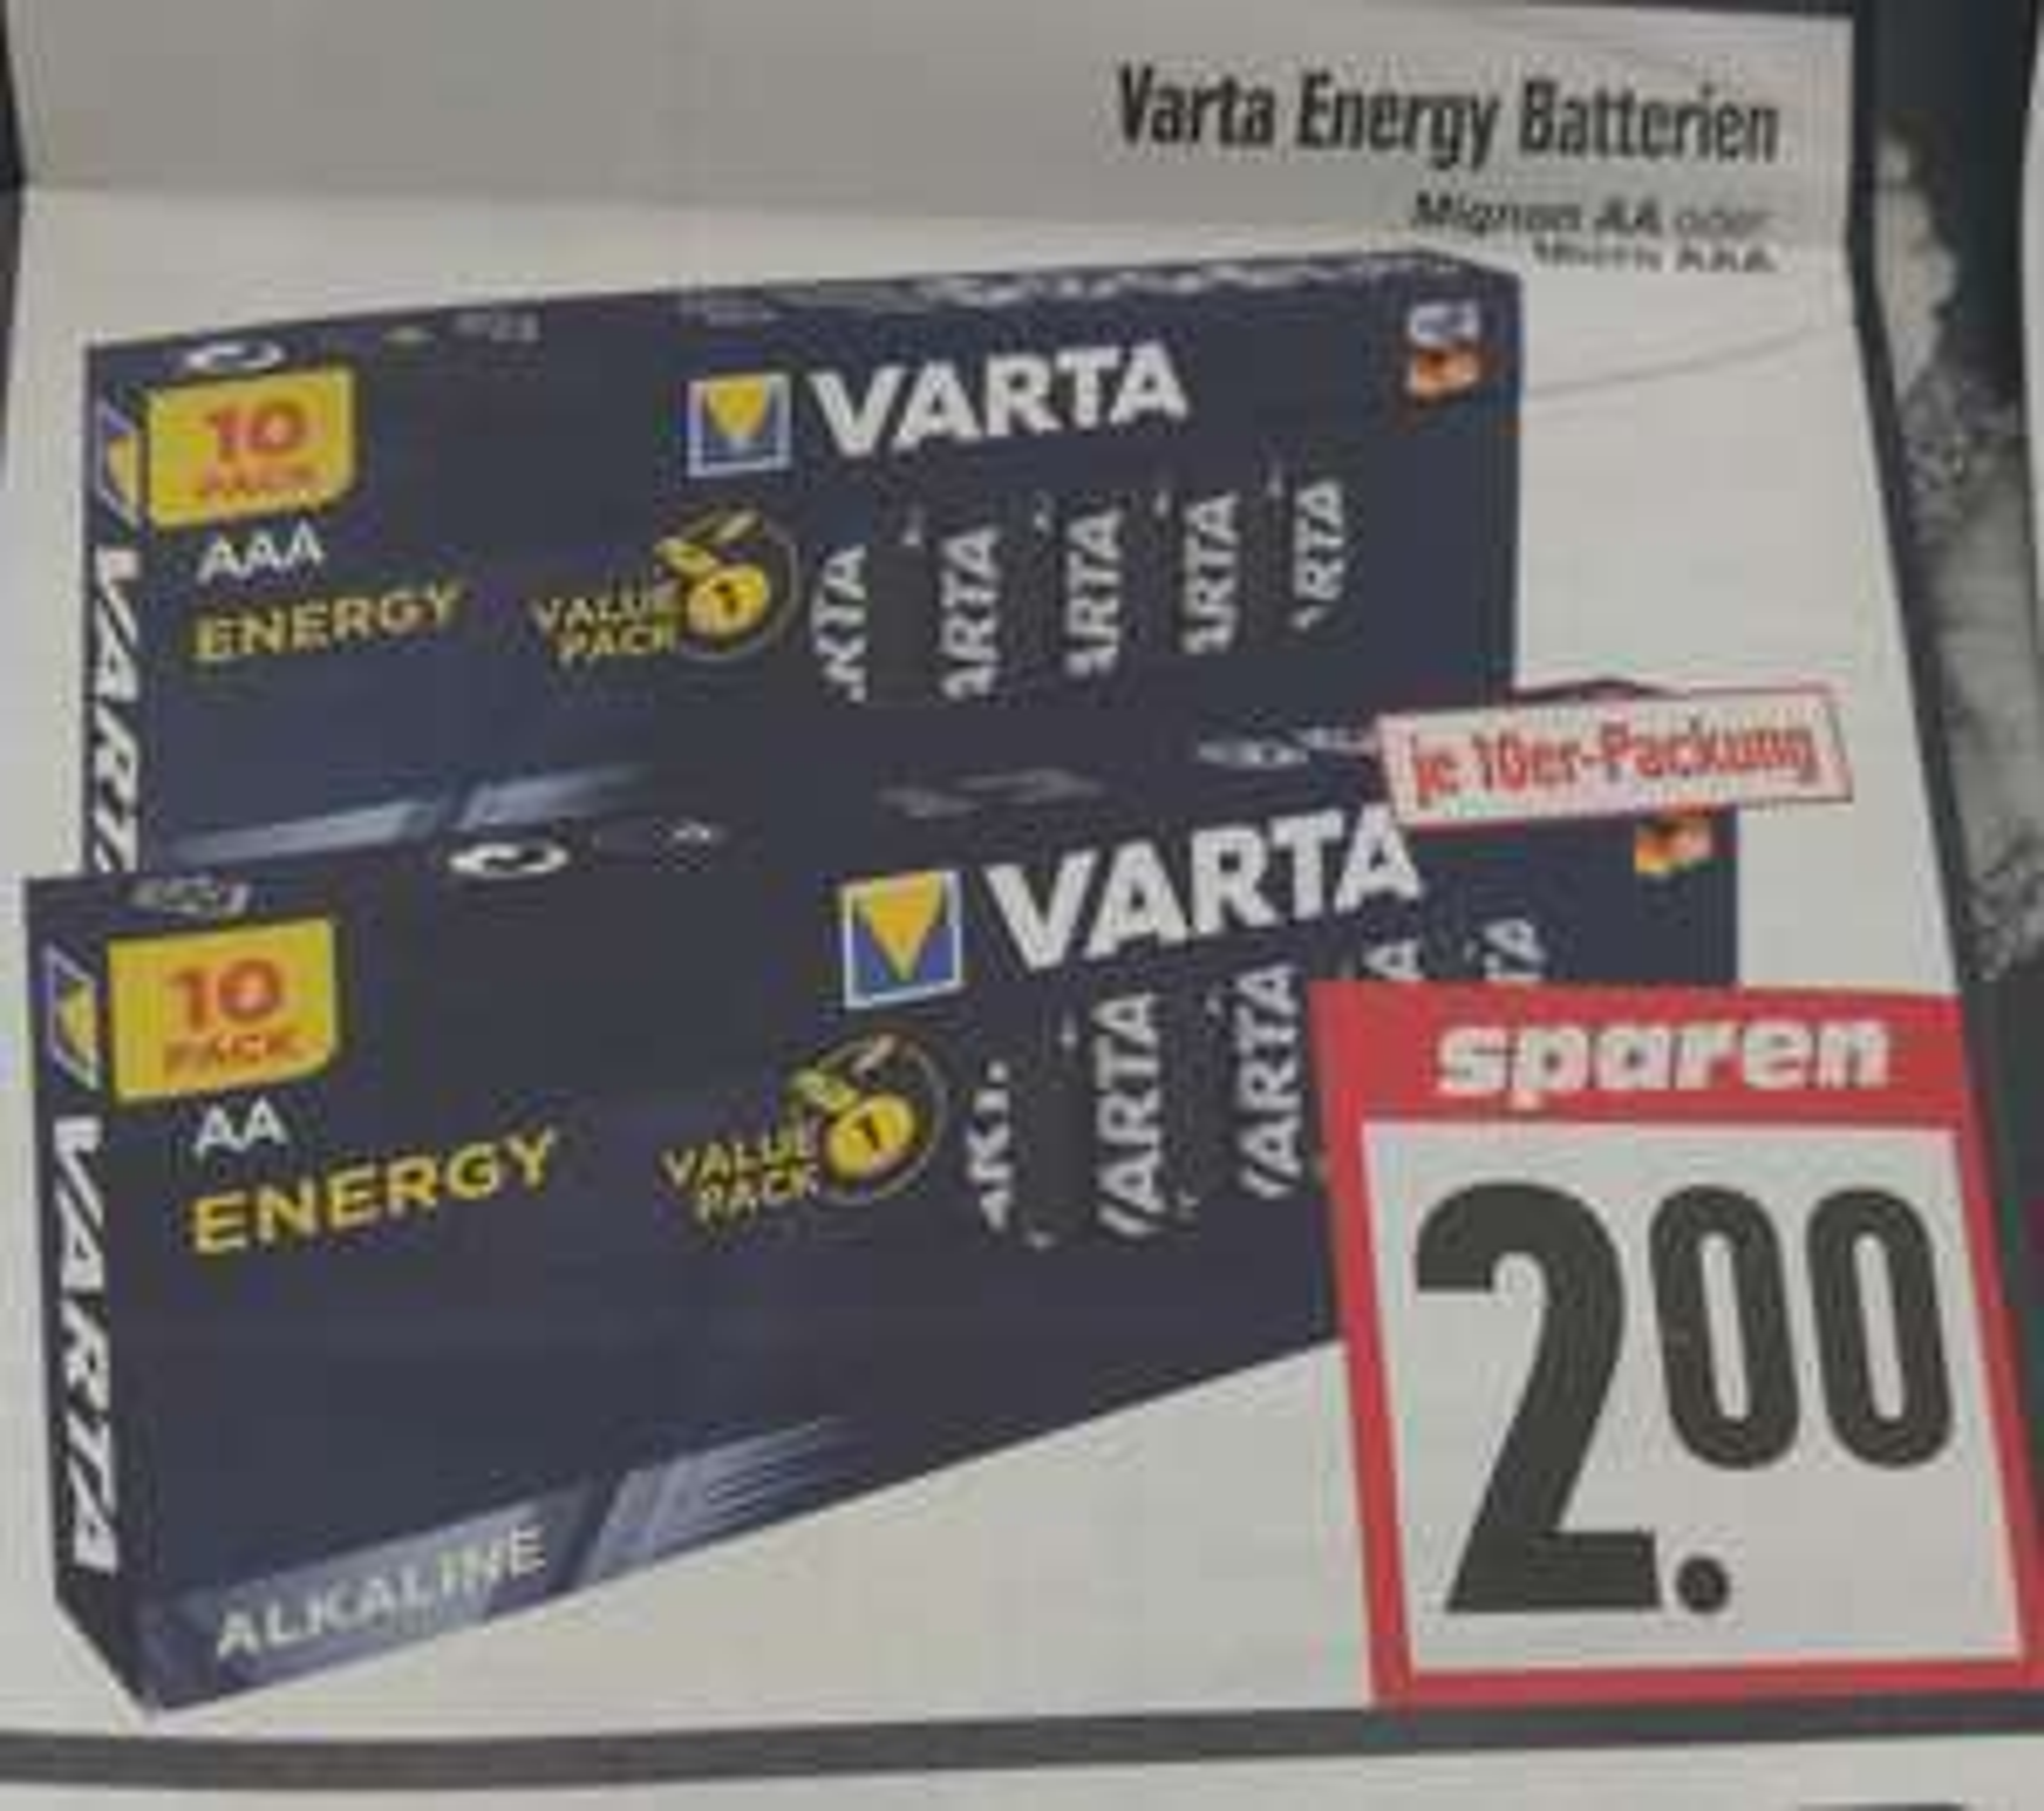 [Edeka/Hessenring] Varta Energy Batterien AA oder AAA 10er Pack für jeweils 2,-€ ab 28.06.2021